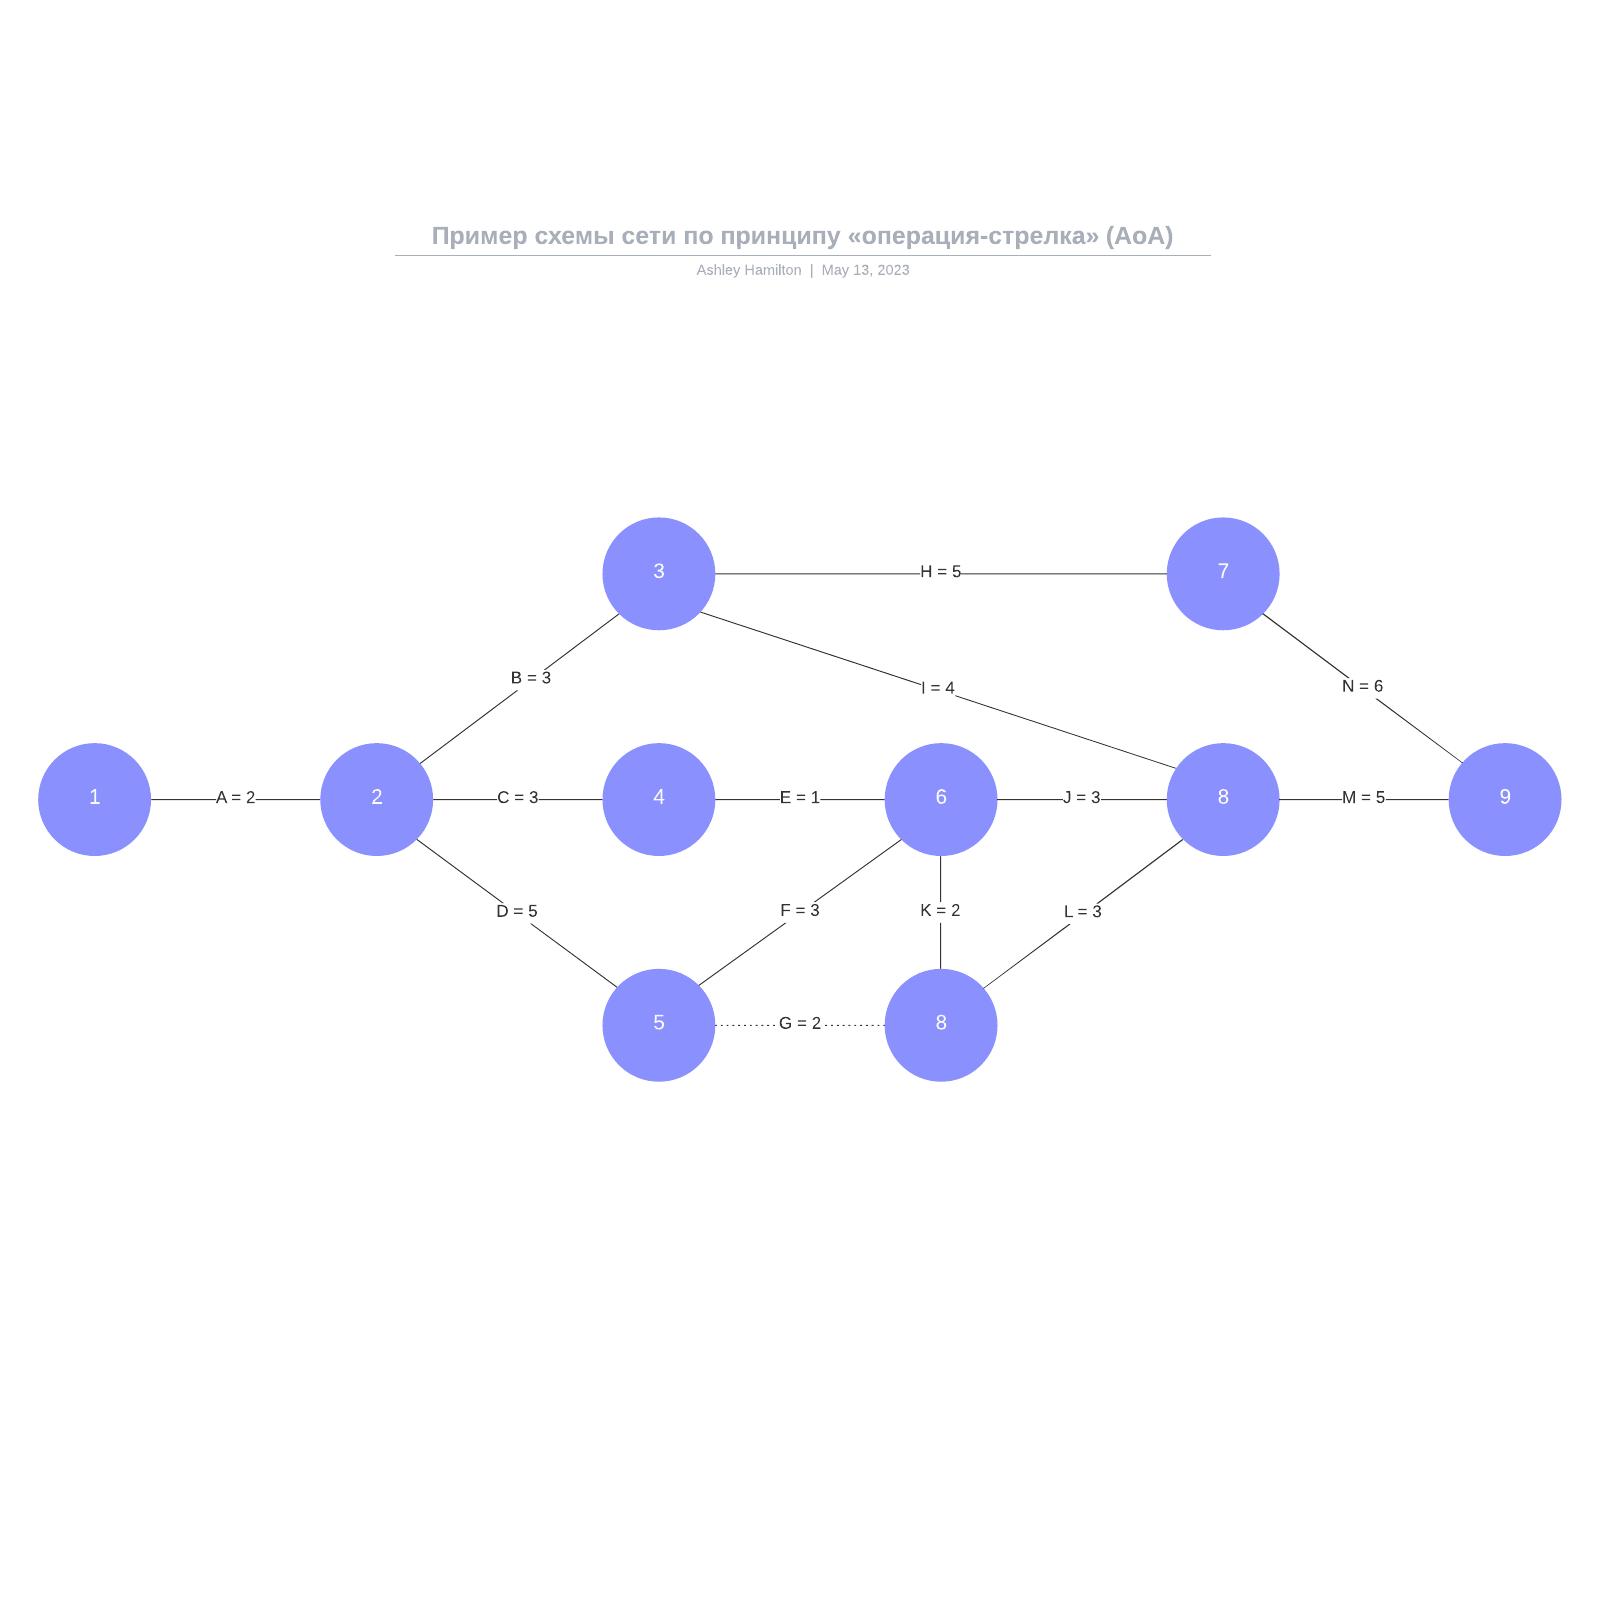 Пример схемы сети по принципу «операция-стрелка» (AoA)